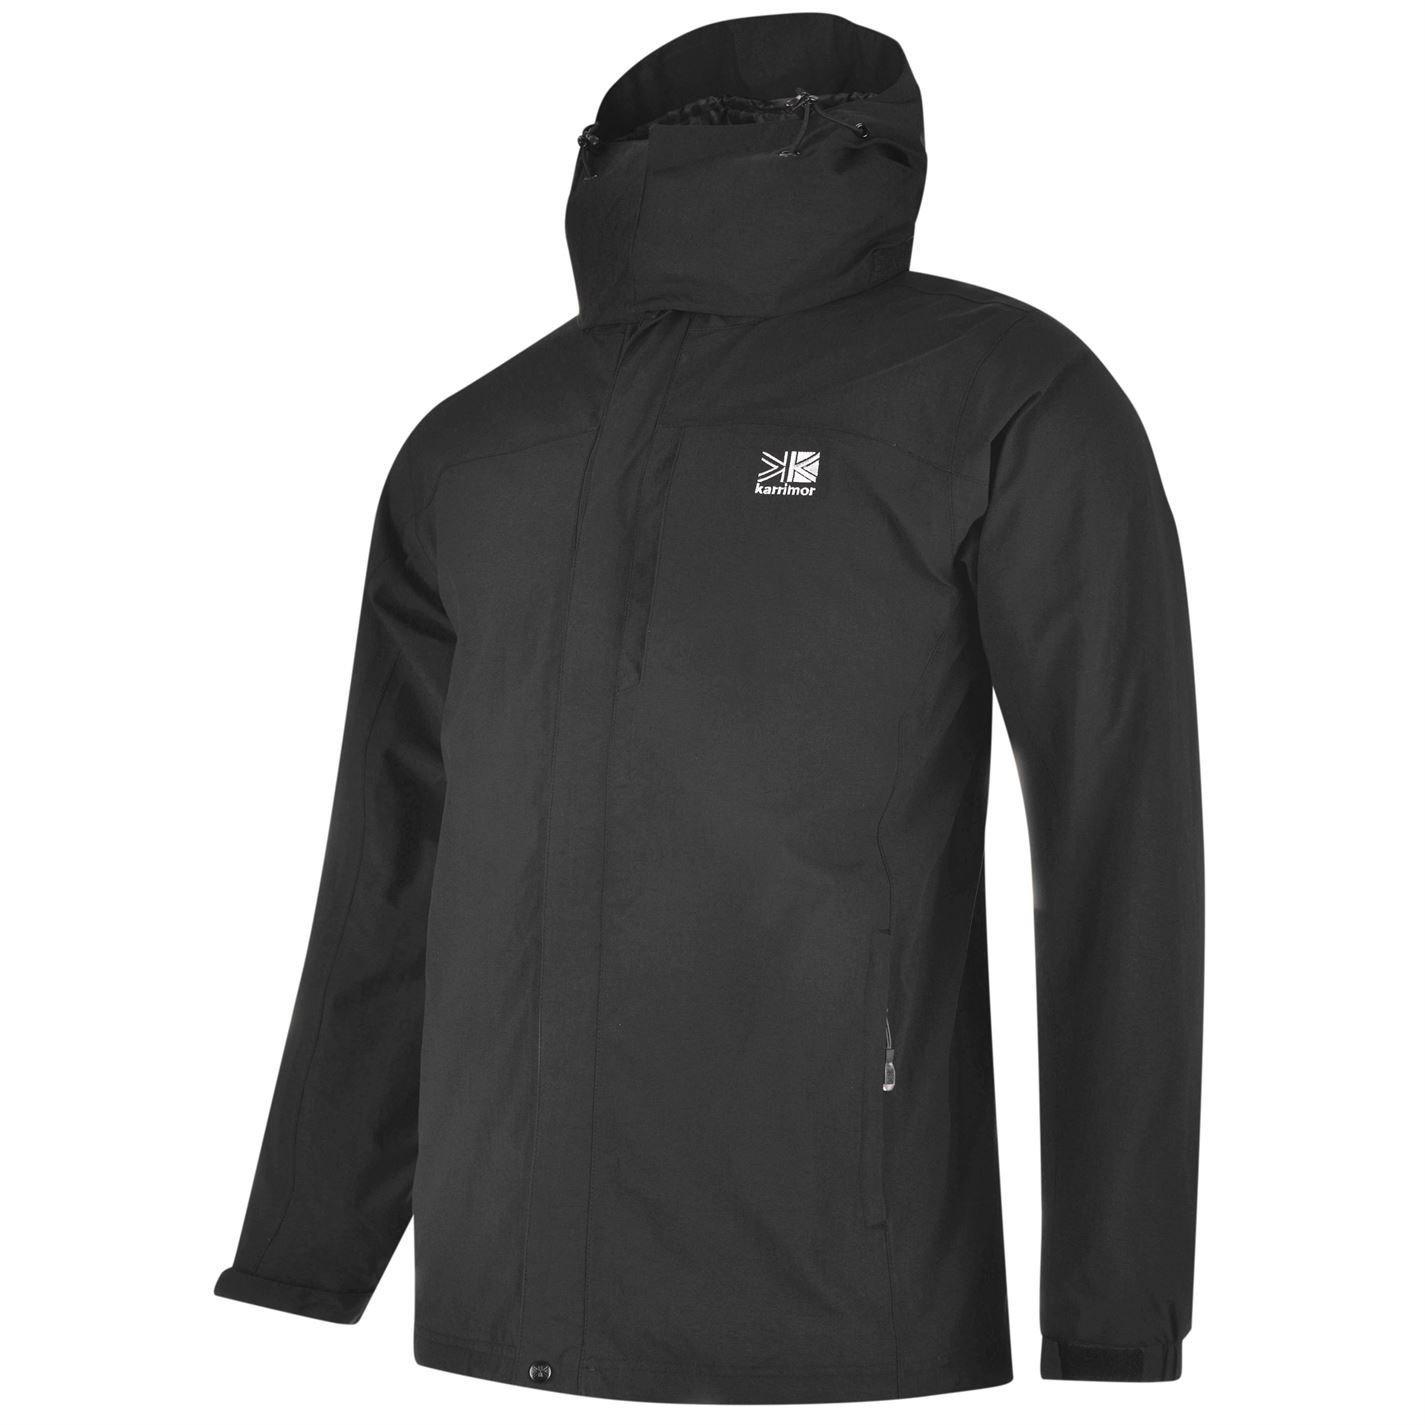 Karrimor para hombre 3 en 1 chaqueta forro de malla Concealable capucha resistente al agua